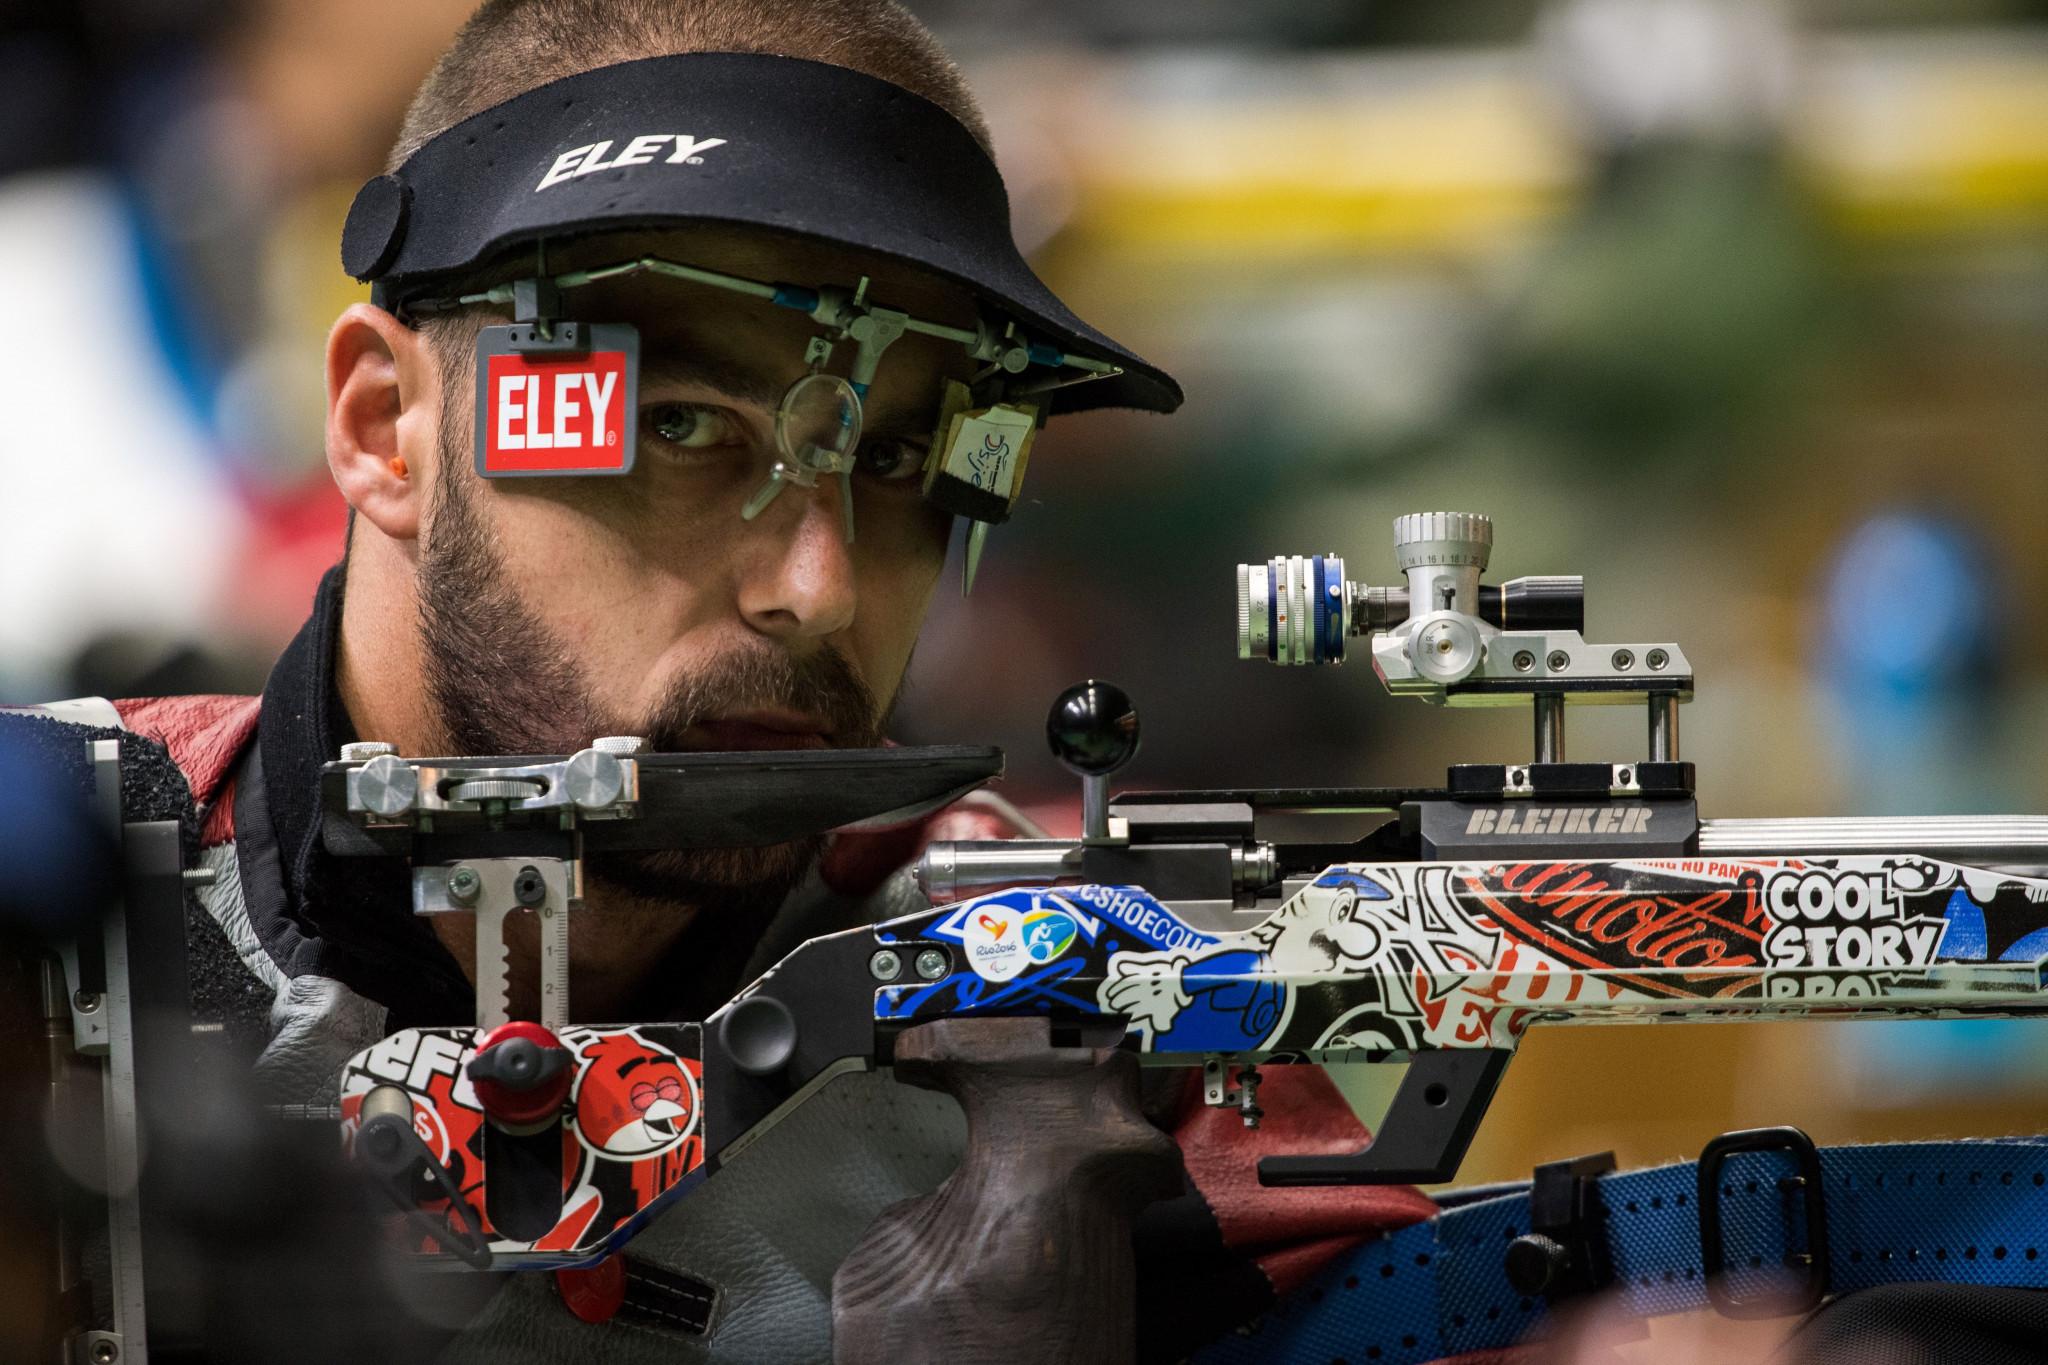 Skelhon and Norberg on target as Para Shooting World Cup begins